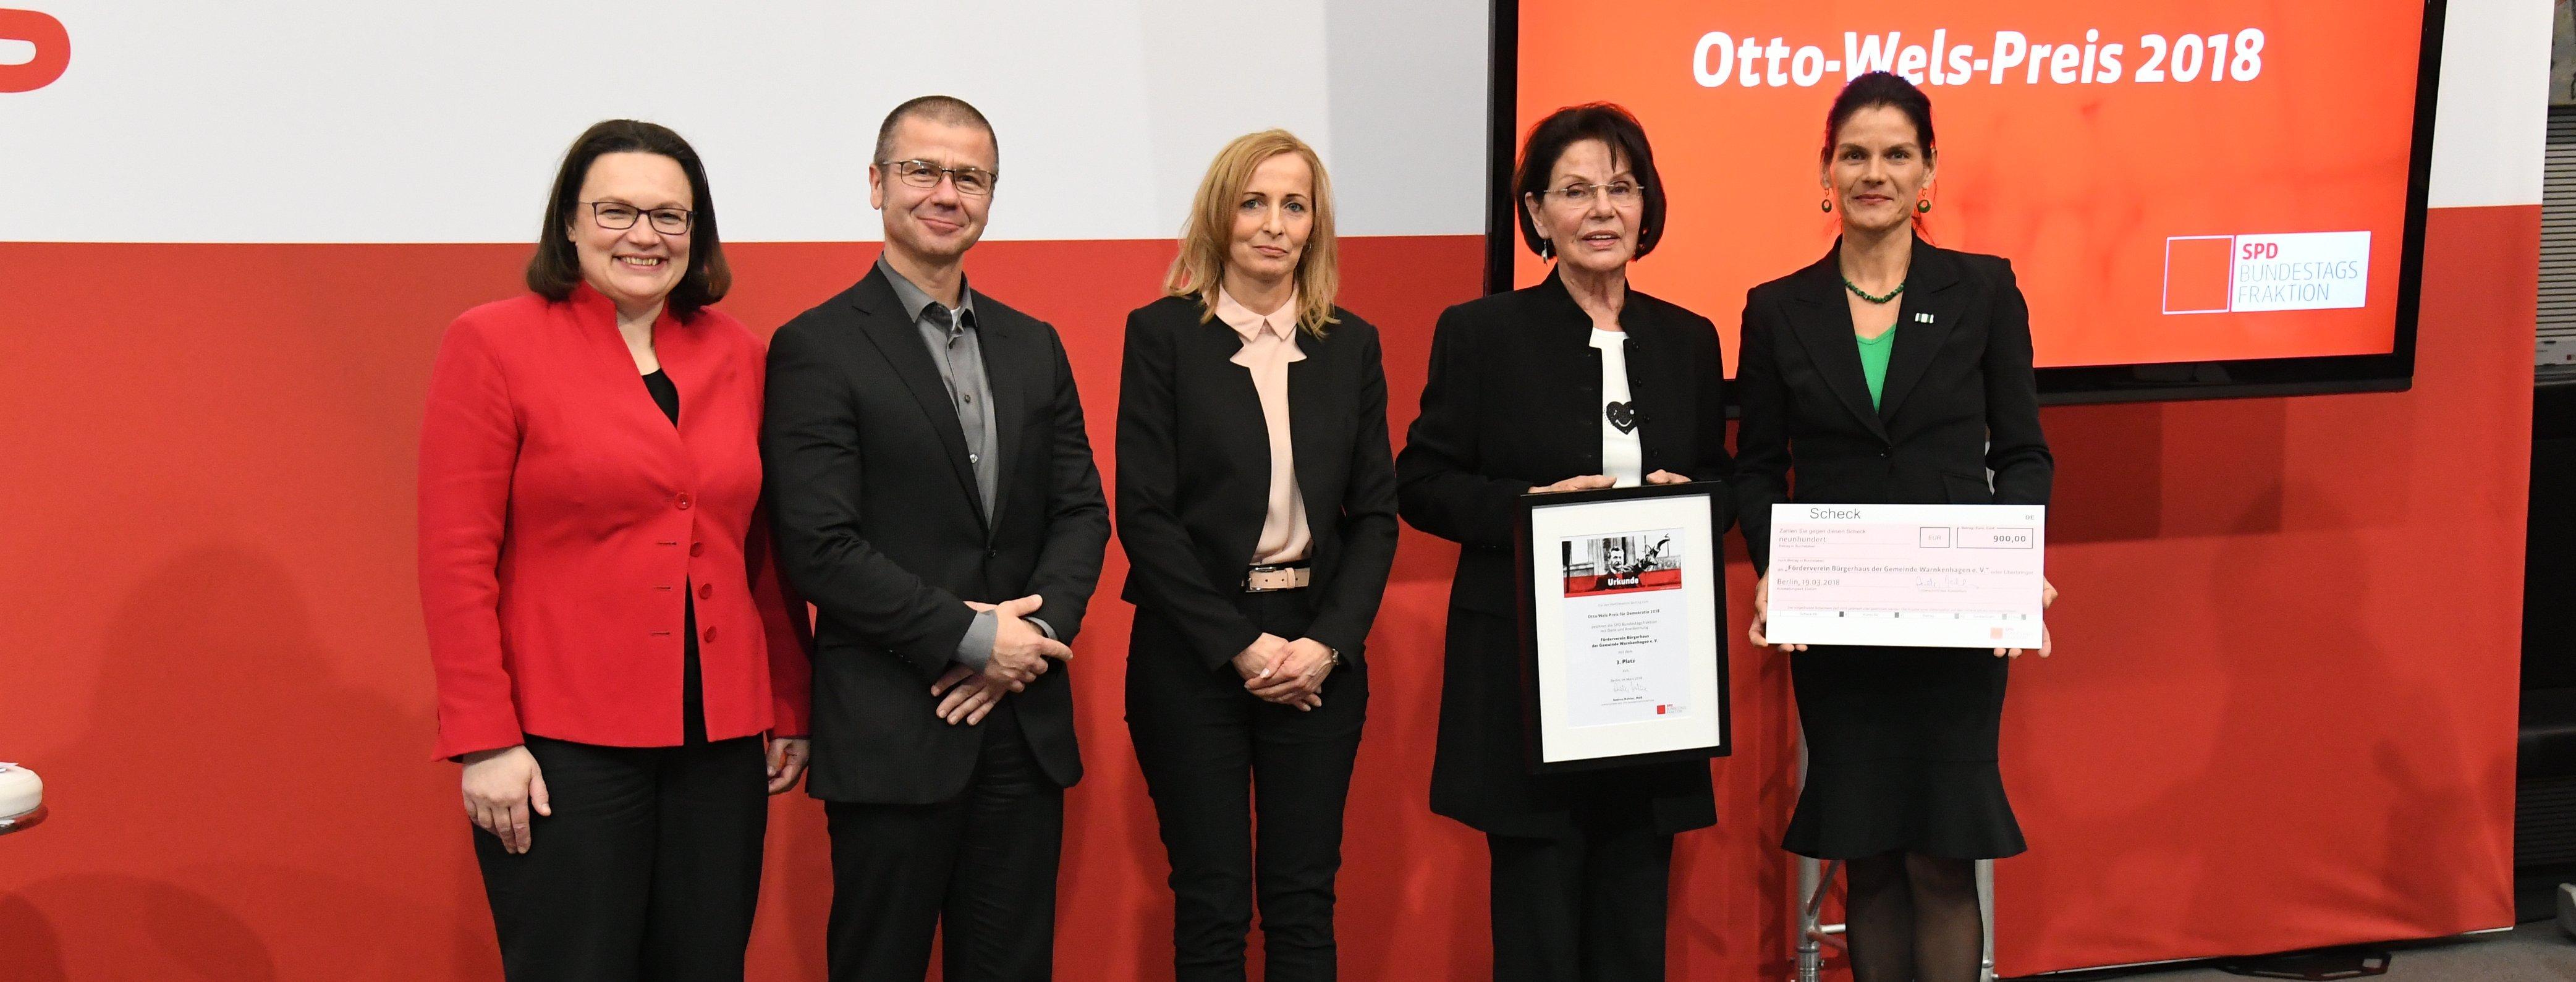 Otto-Wels-Preis_2018 - Homepage